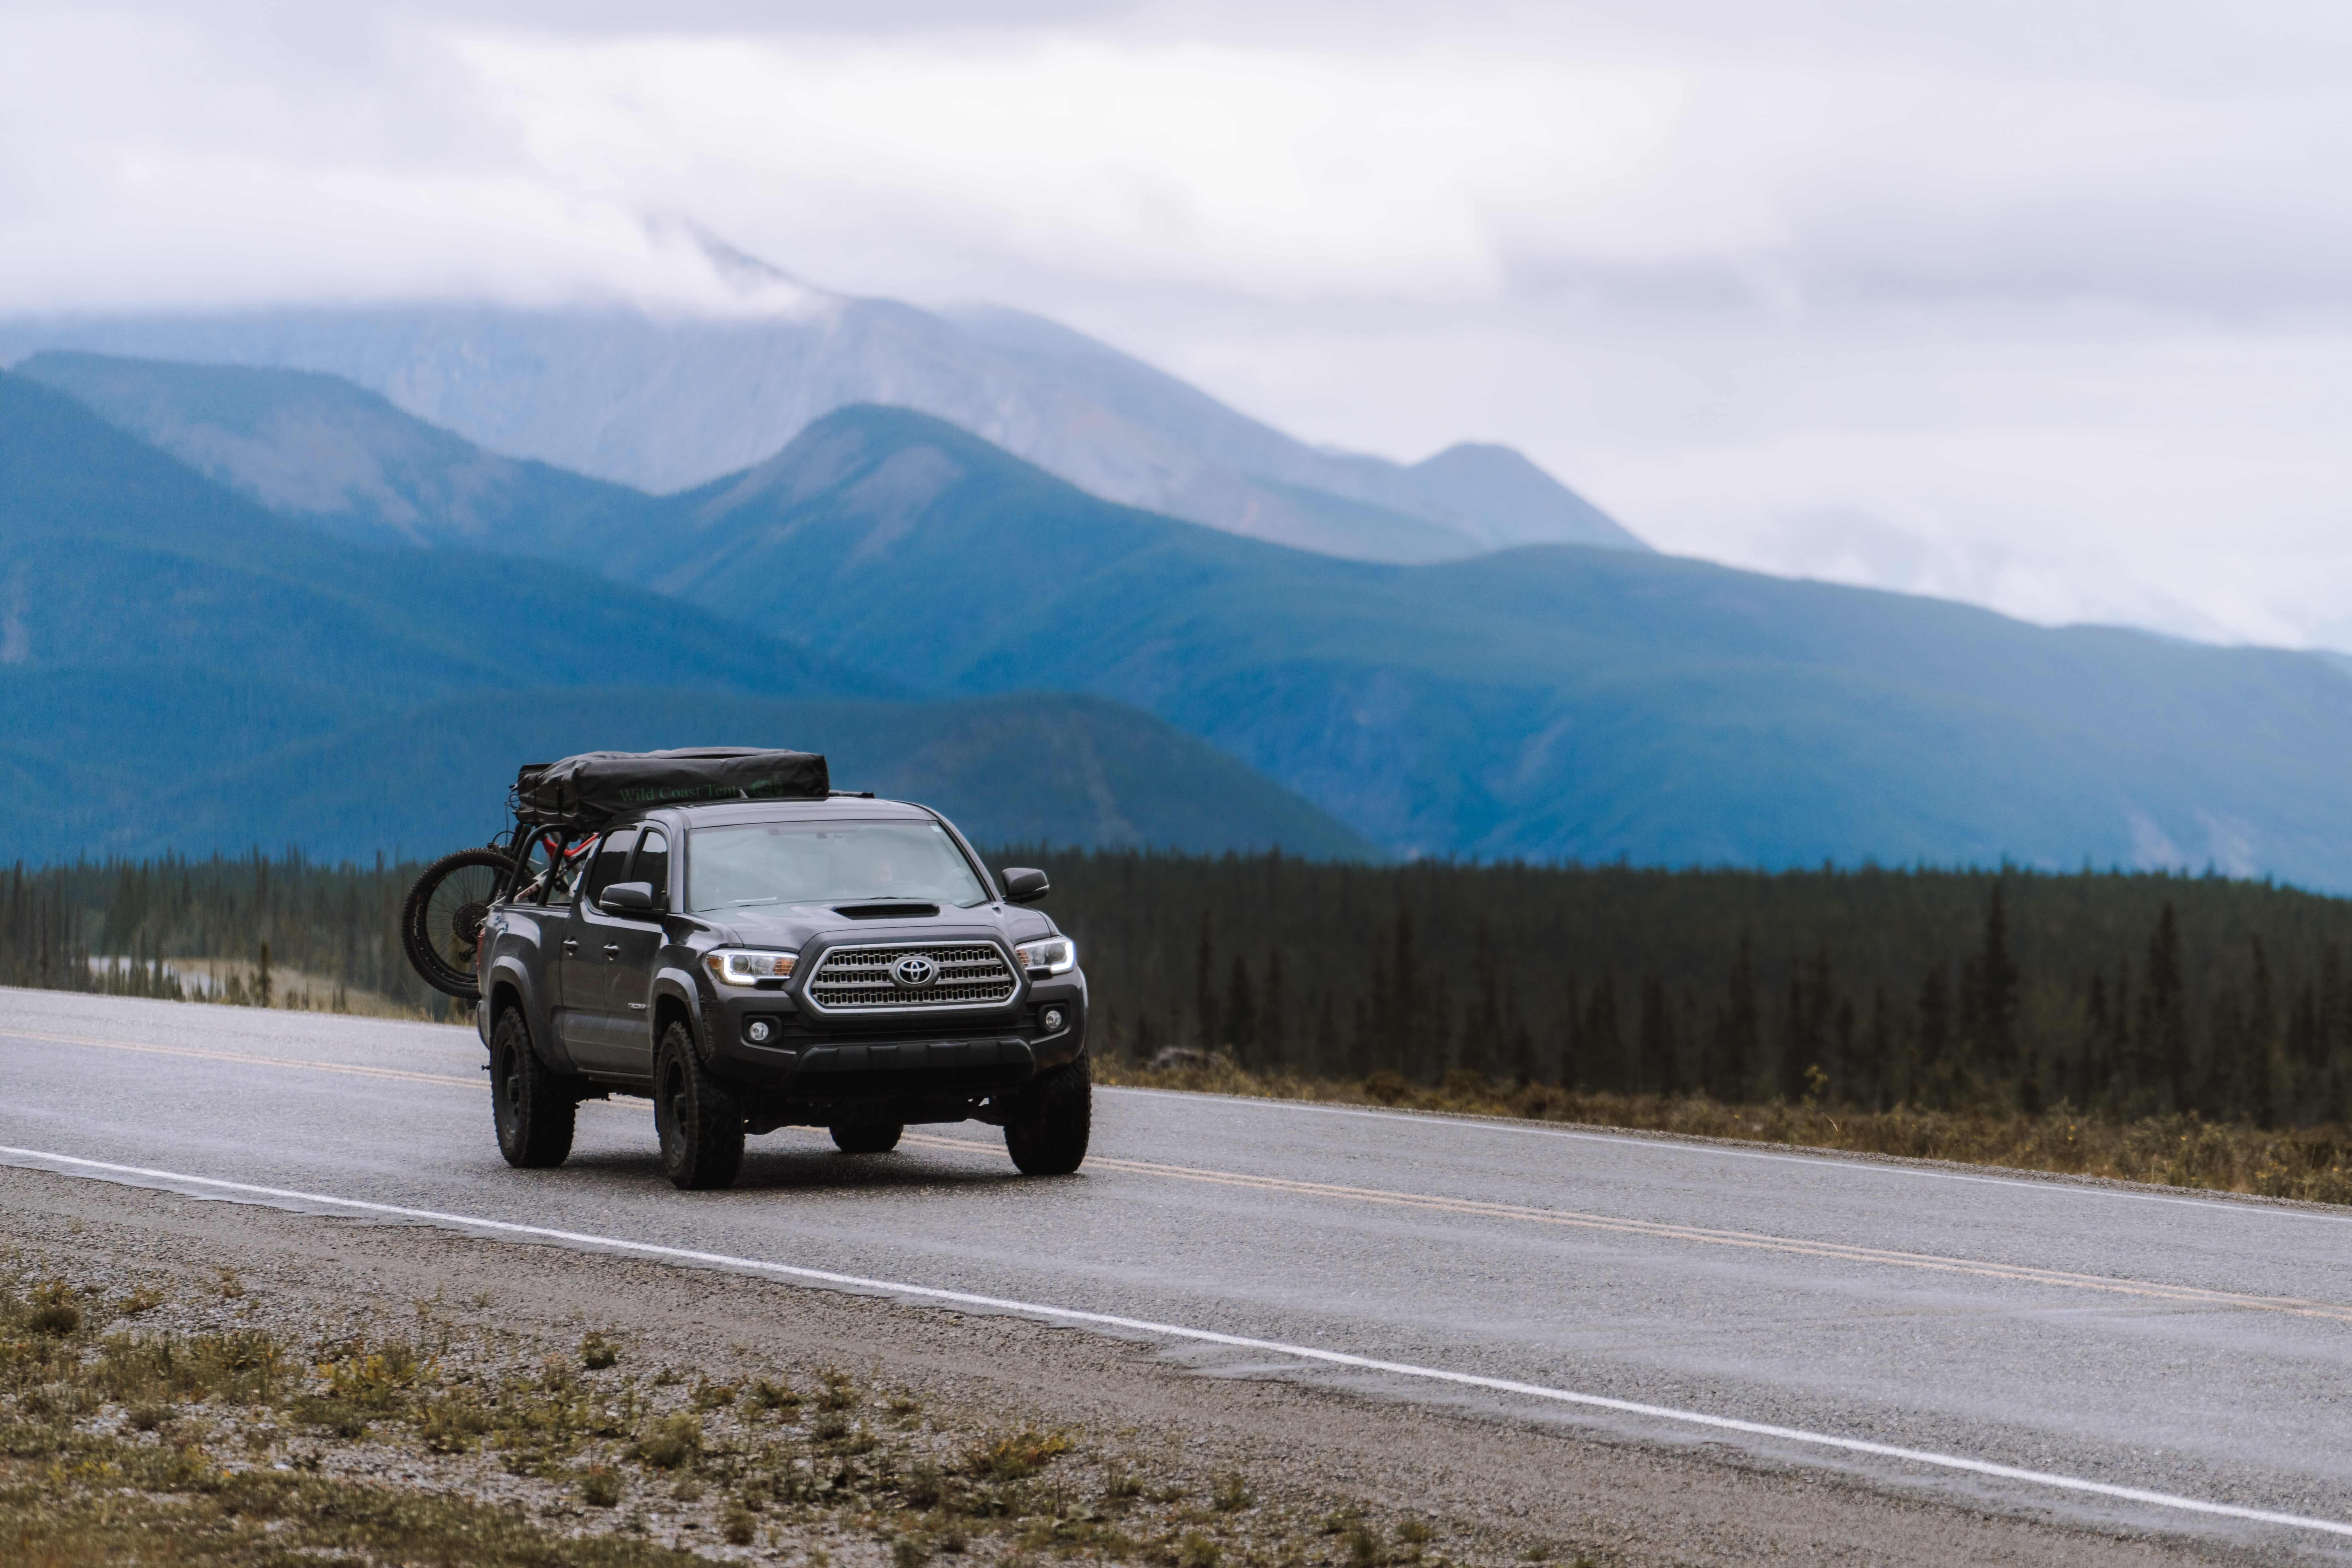 Toyota Tacoma Adventure: Yukon Road Trip